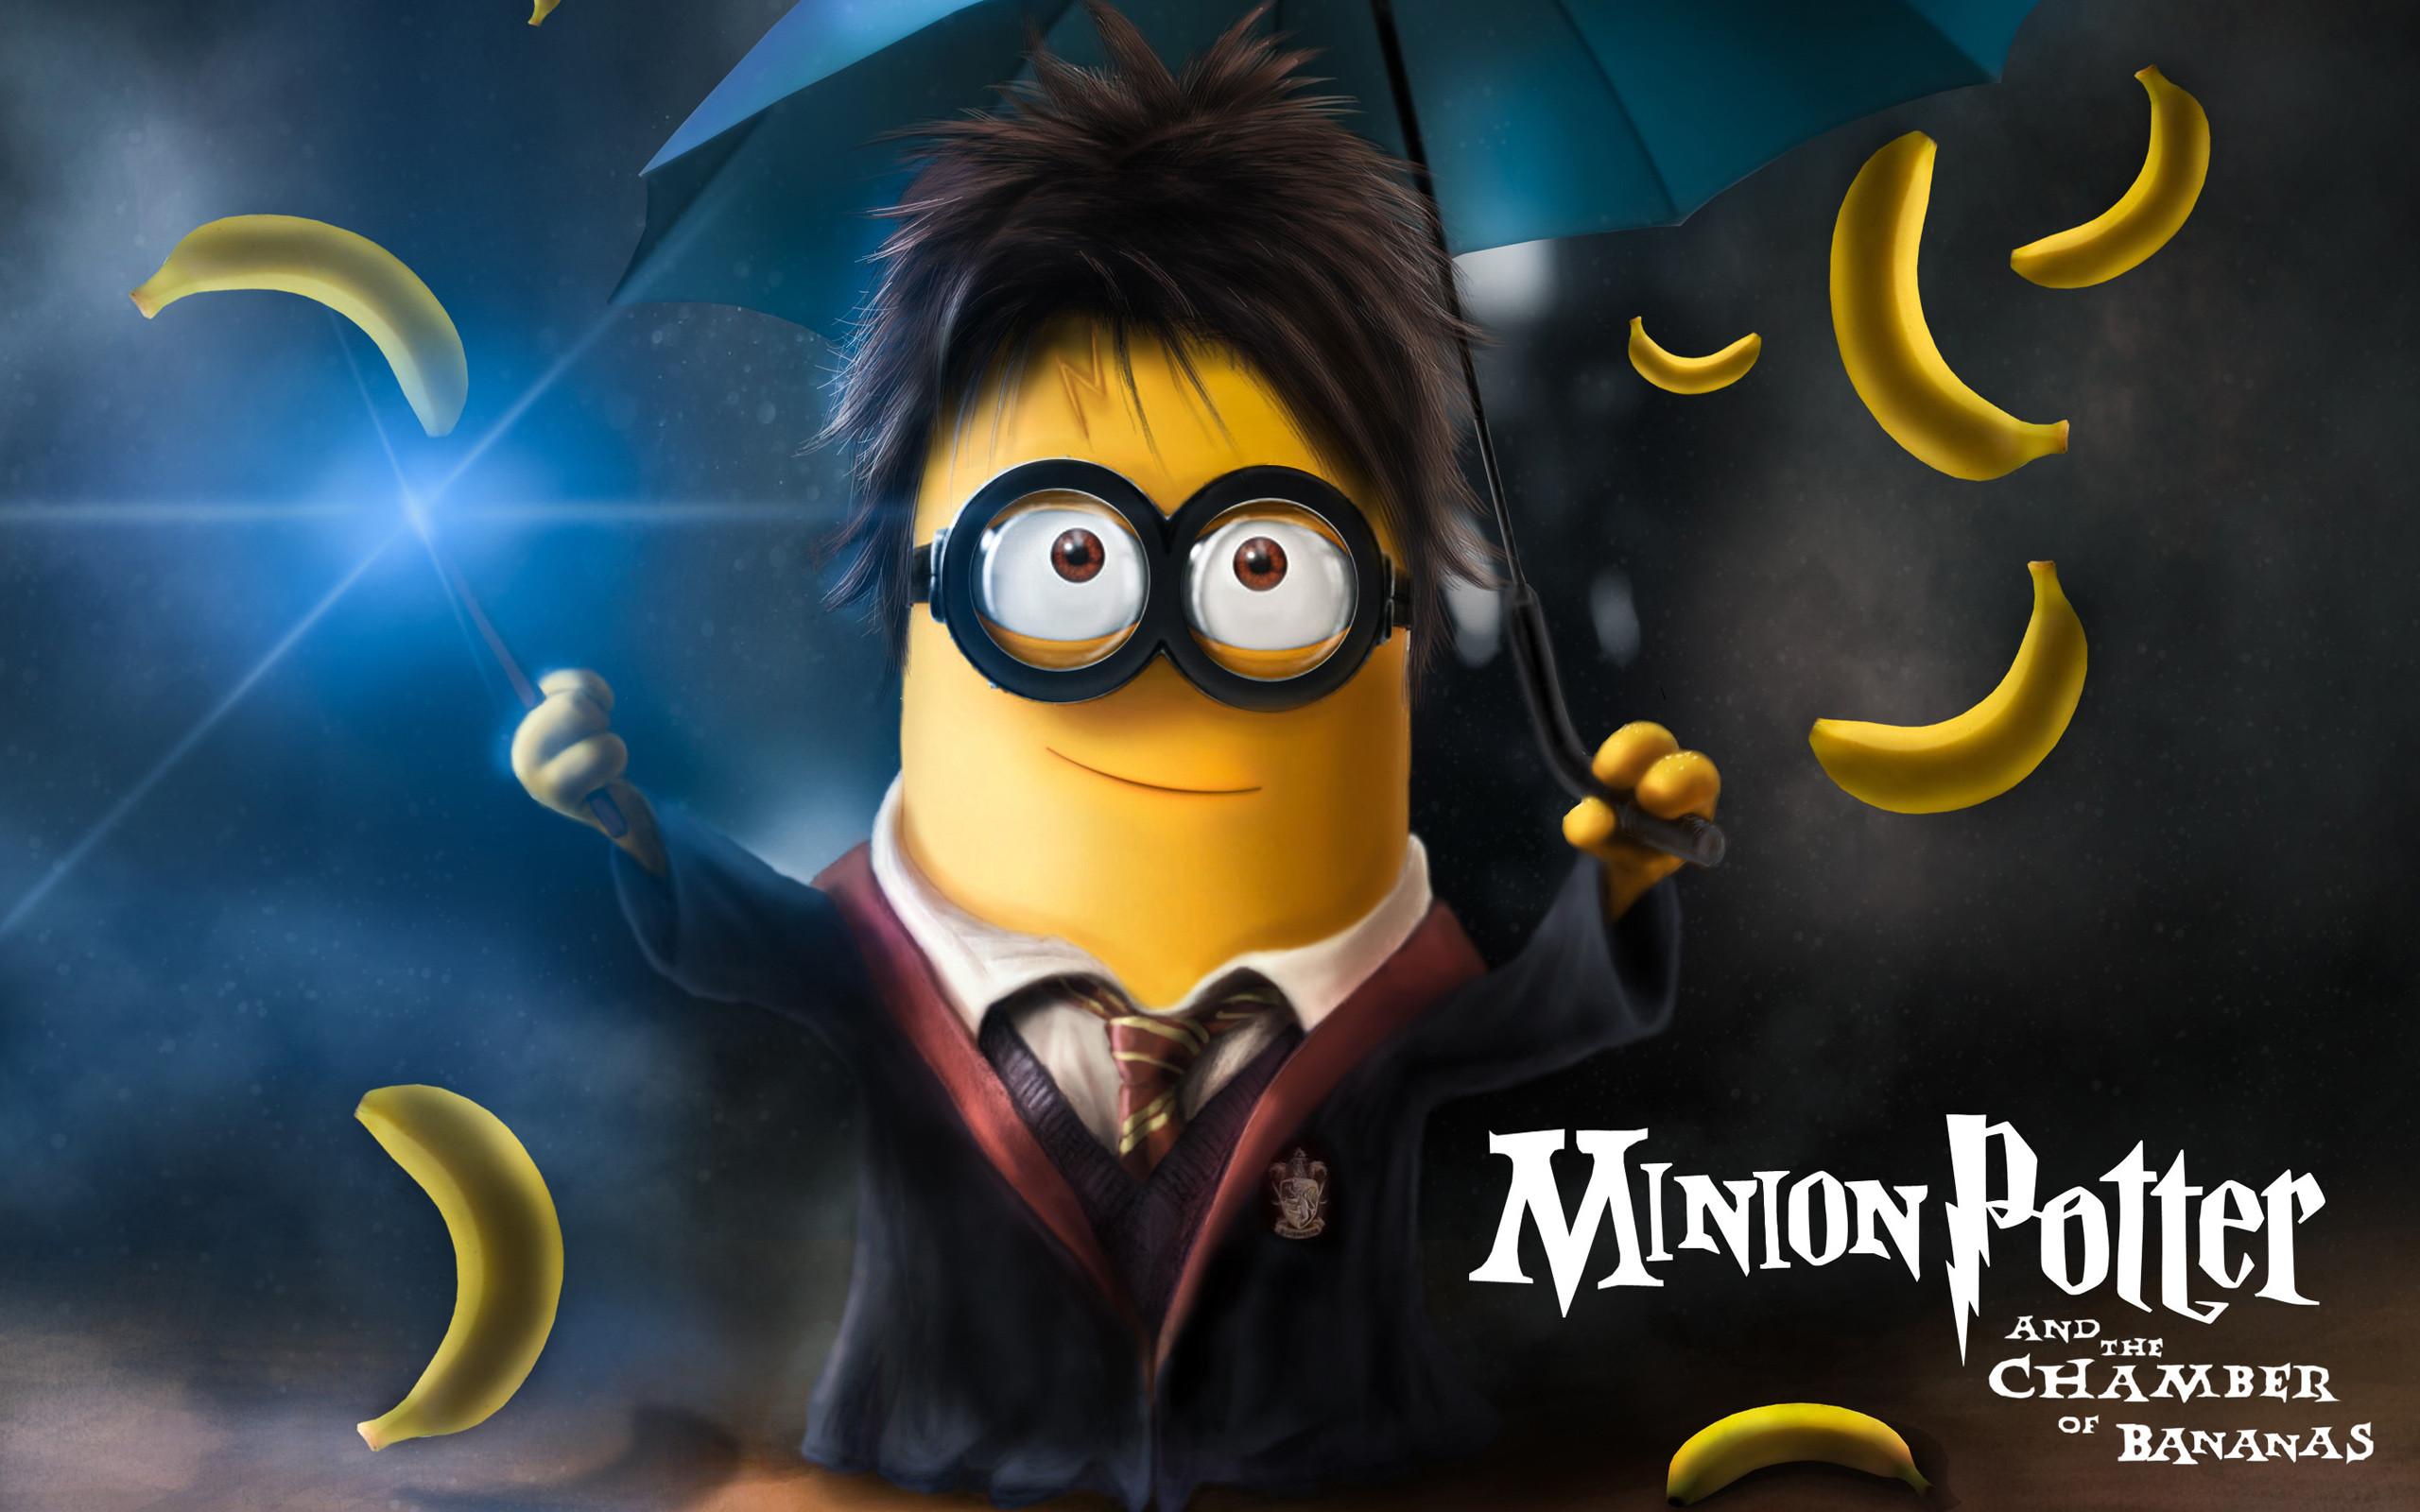 Minion Potter